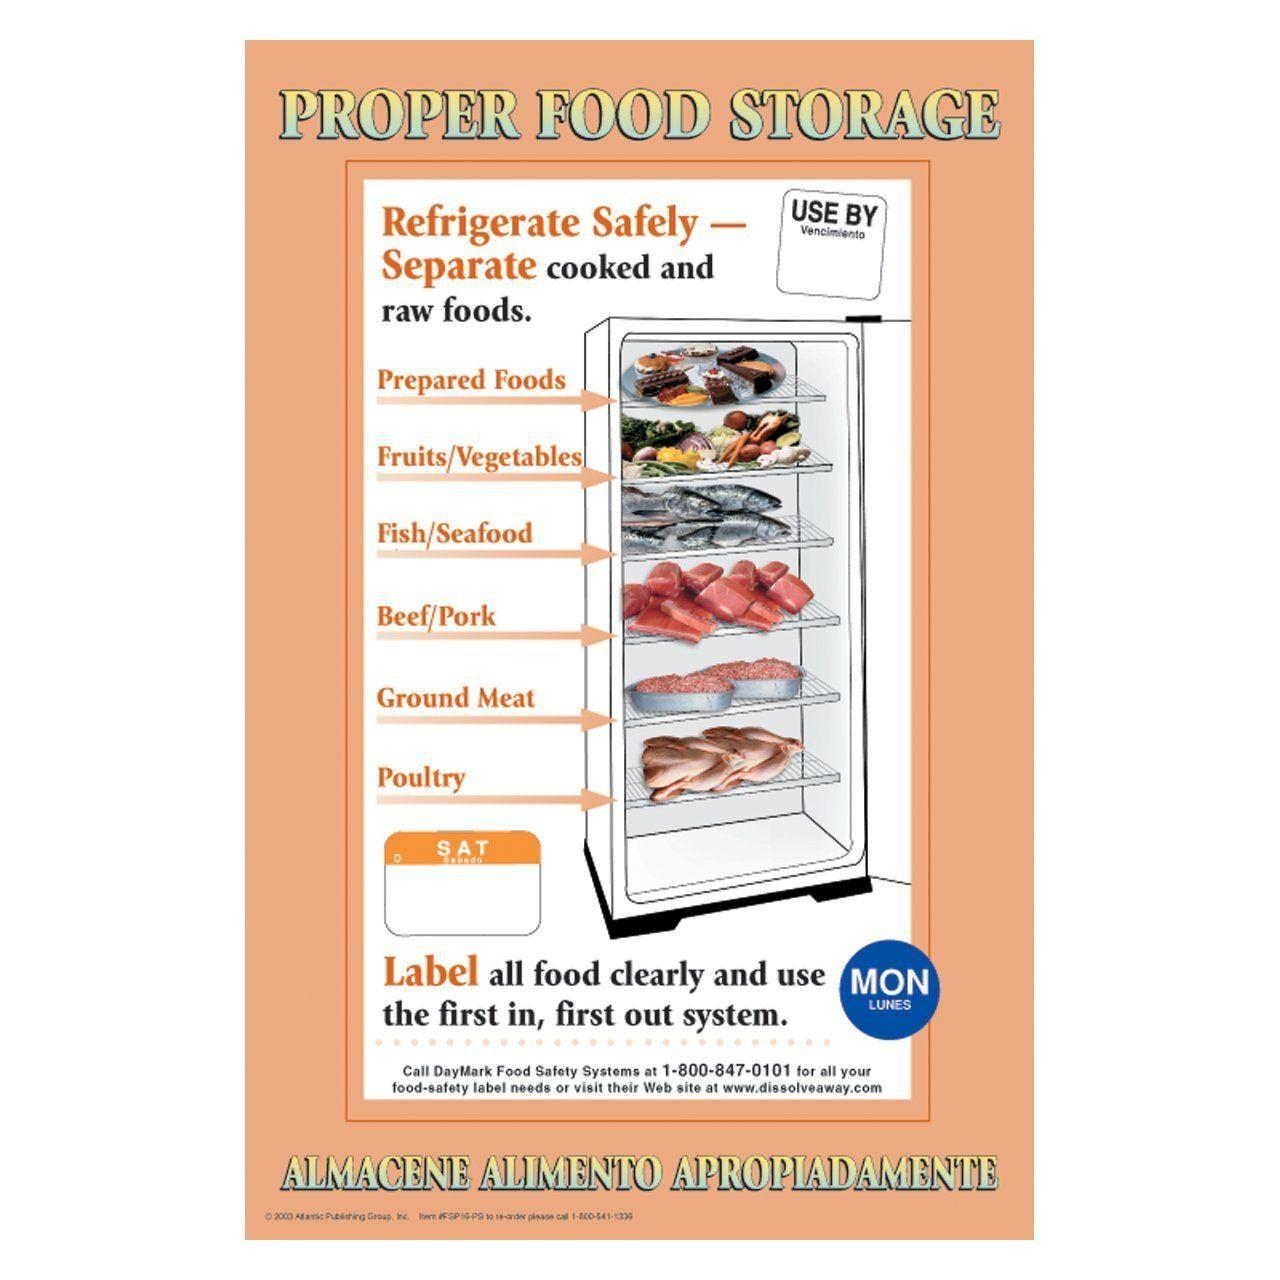 Proper Food Storage Poster Interesting About Remodel Home Design